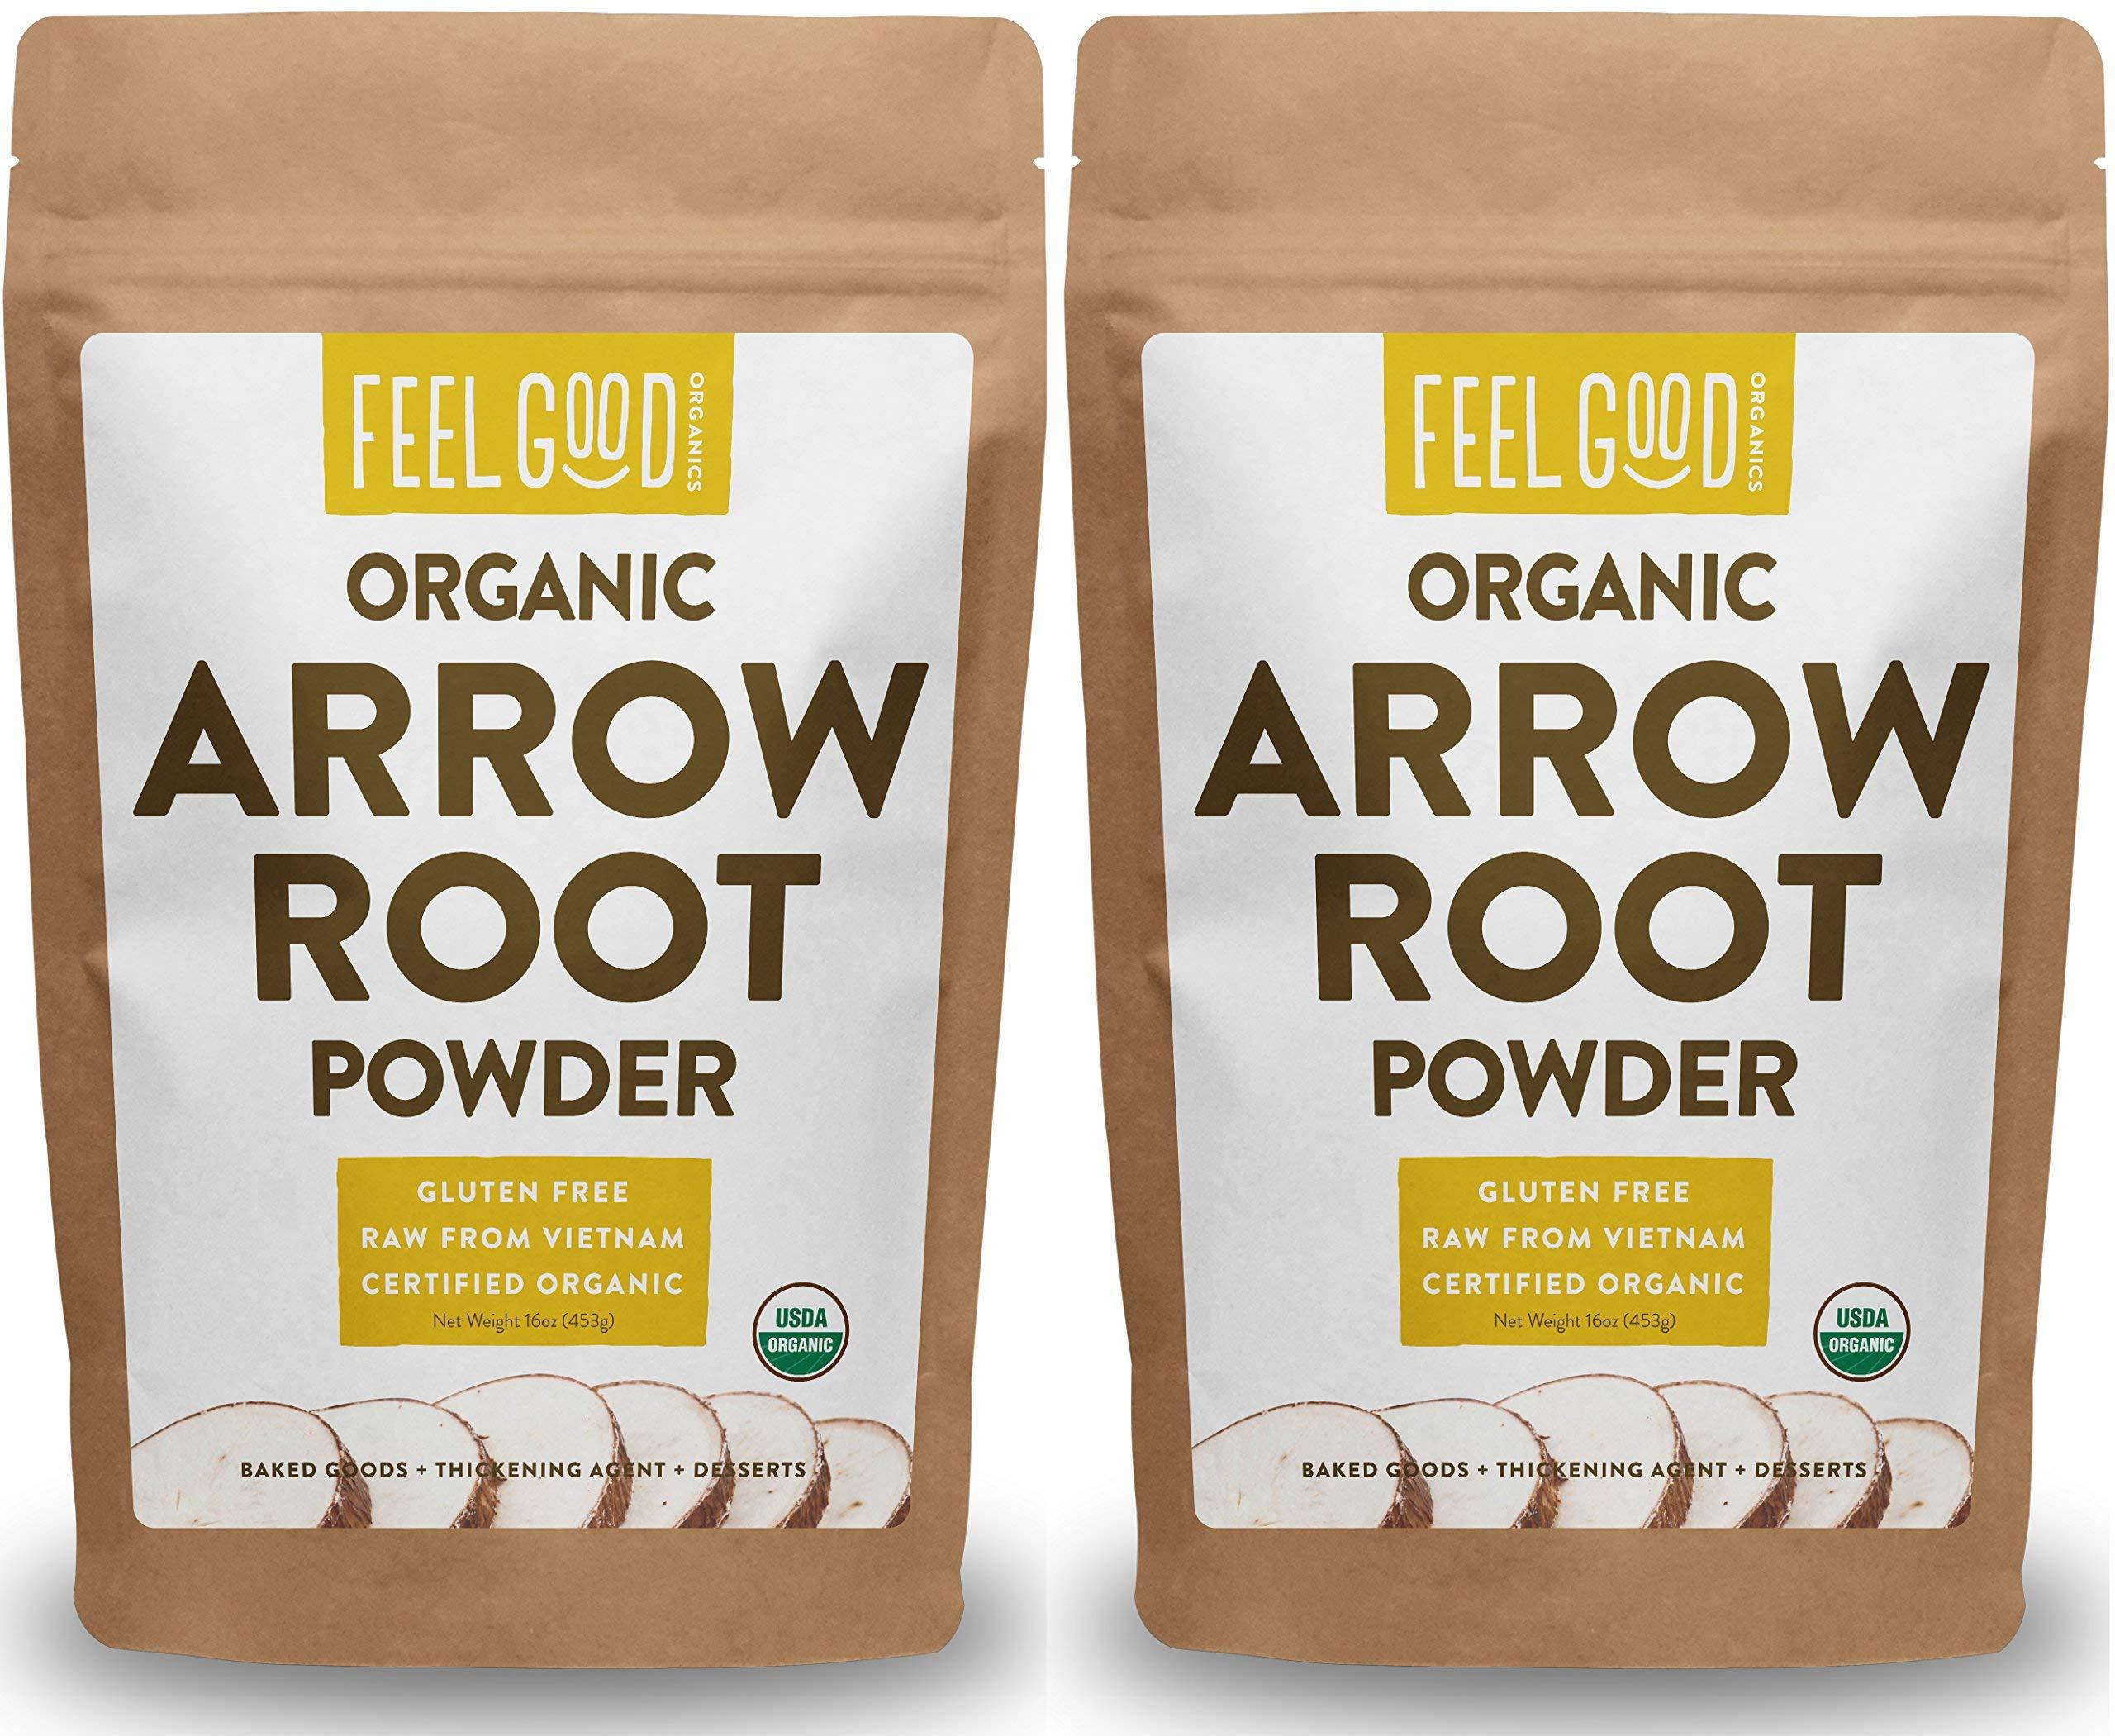 Organic Arrowroot Powder (Flour) - 2x 1 Pound Reselable Bags (32oz / 2 lbs Total) - 100% Raw From Vietnam - by Feel Good Organics